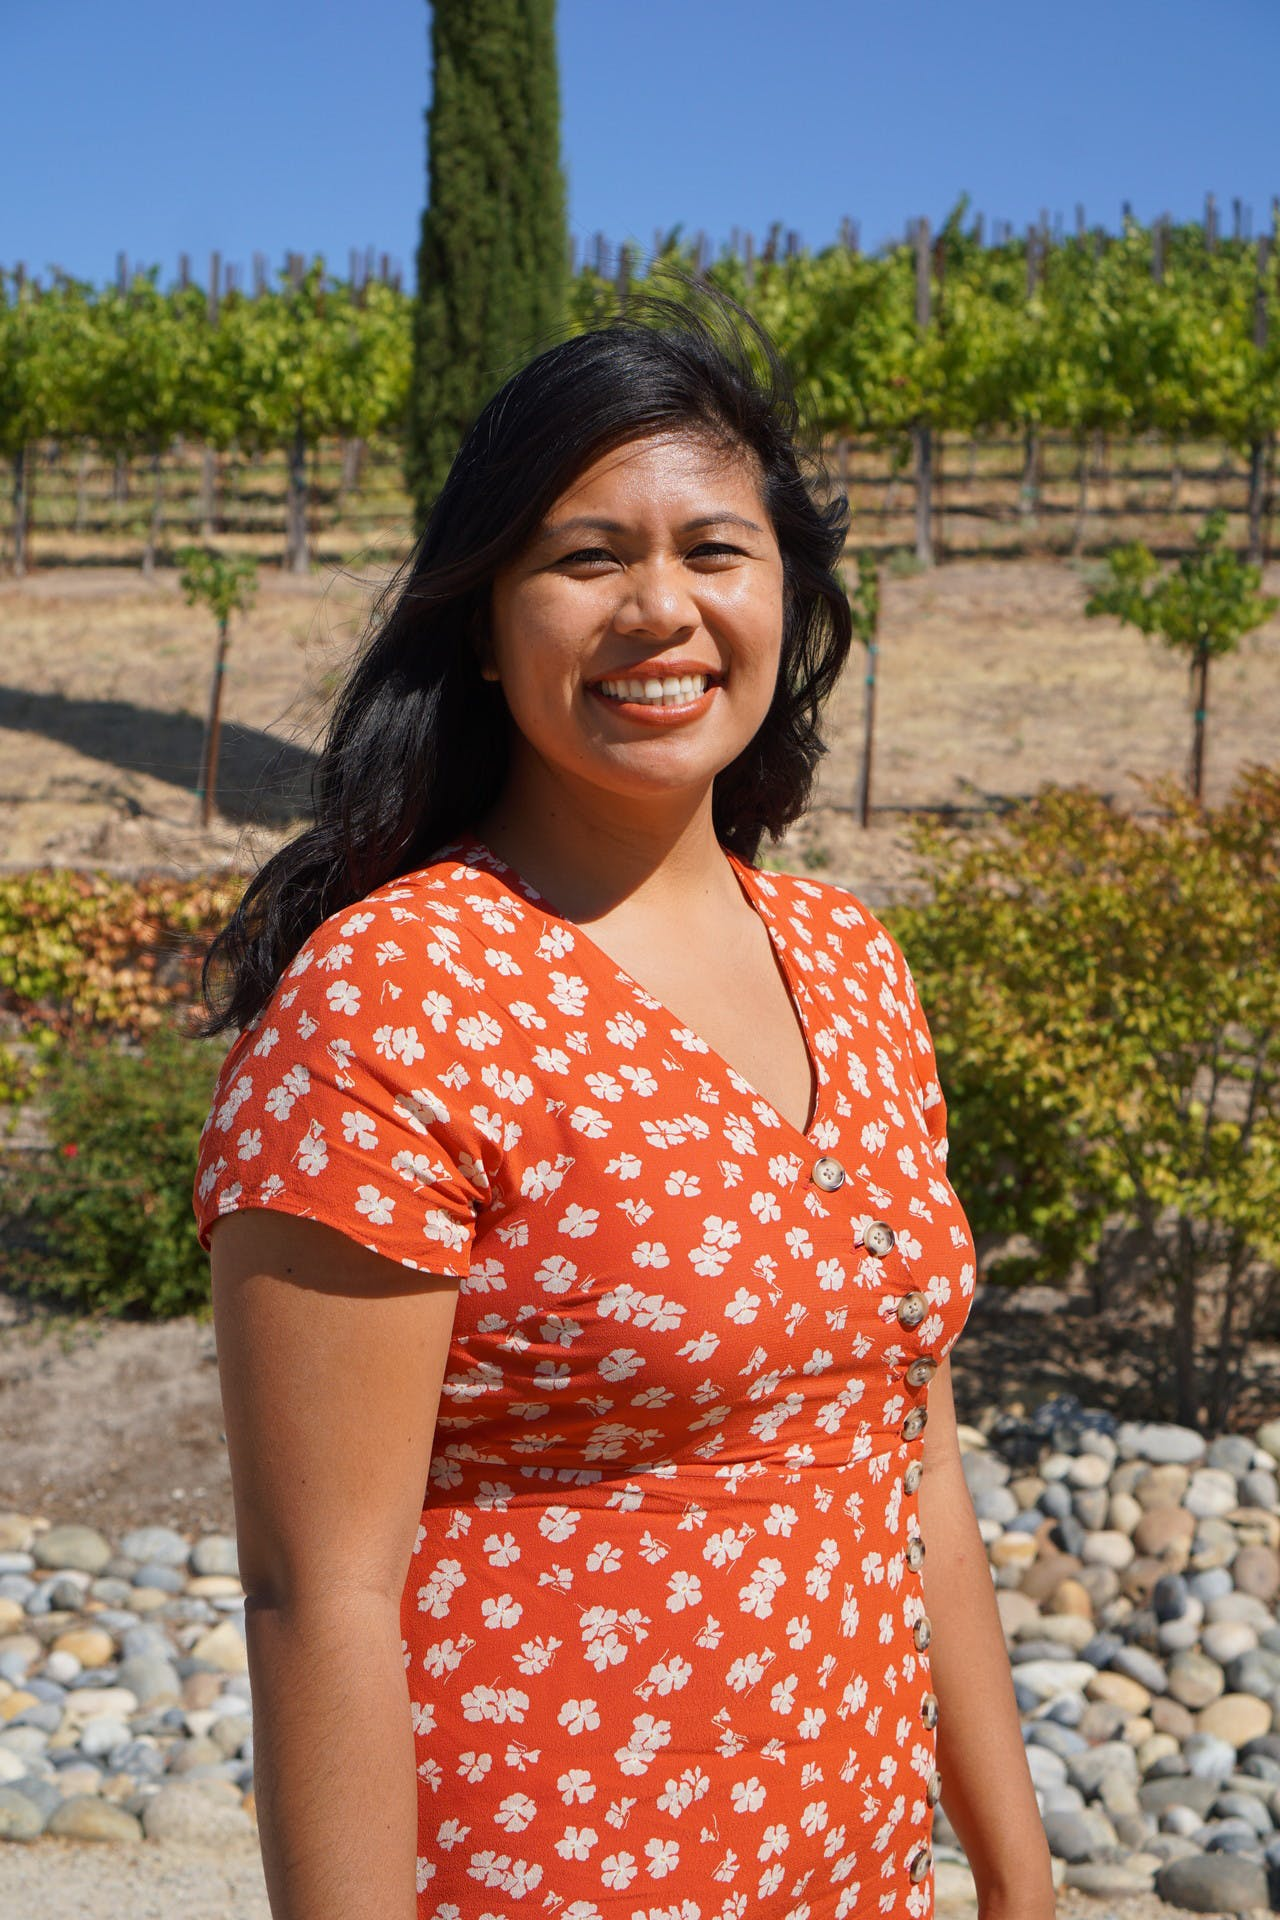 Alyssa is the Southern California Regional Winner of the AMLI Heroes Contest